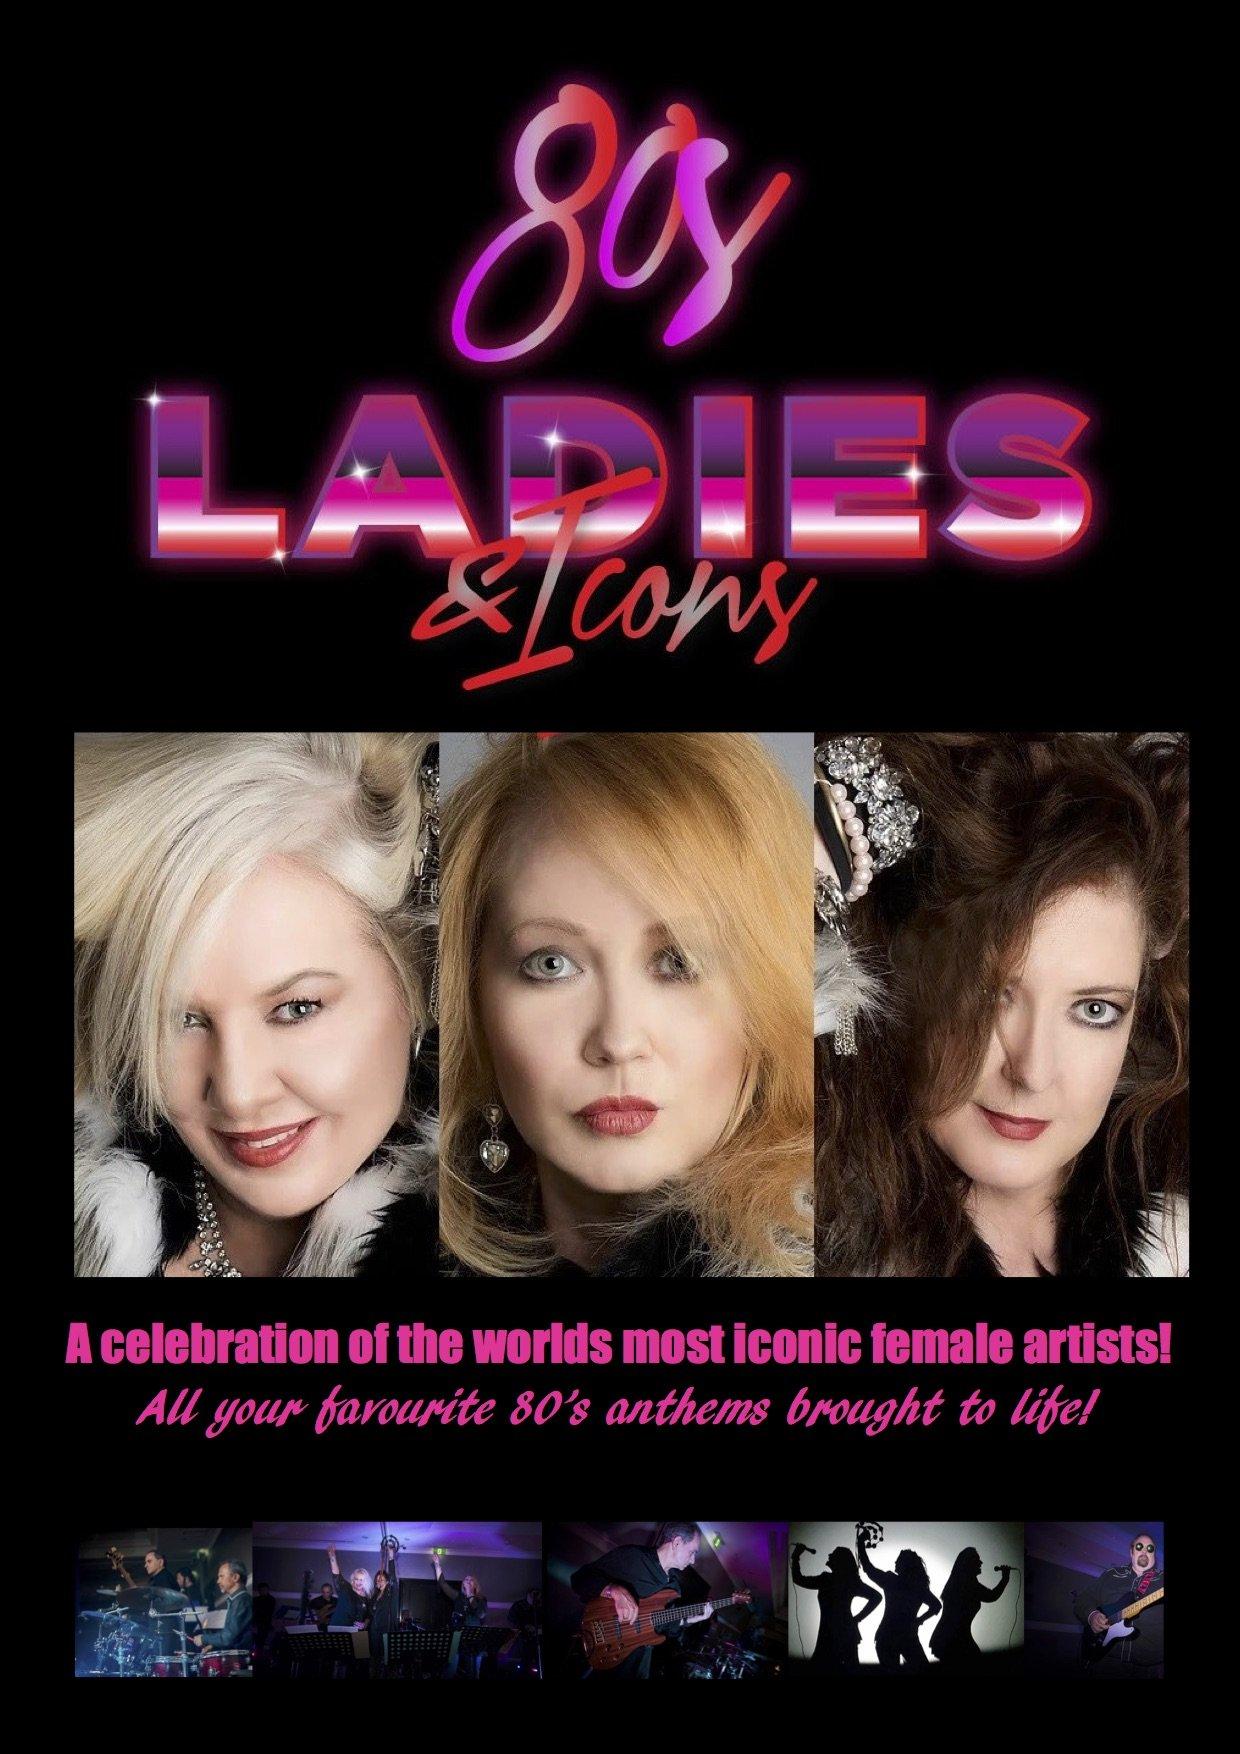 80's Ladies